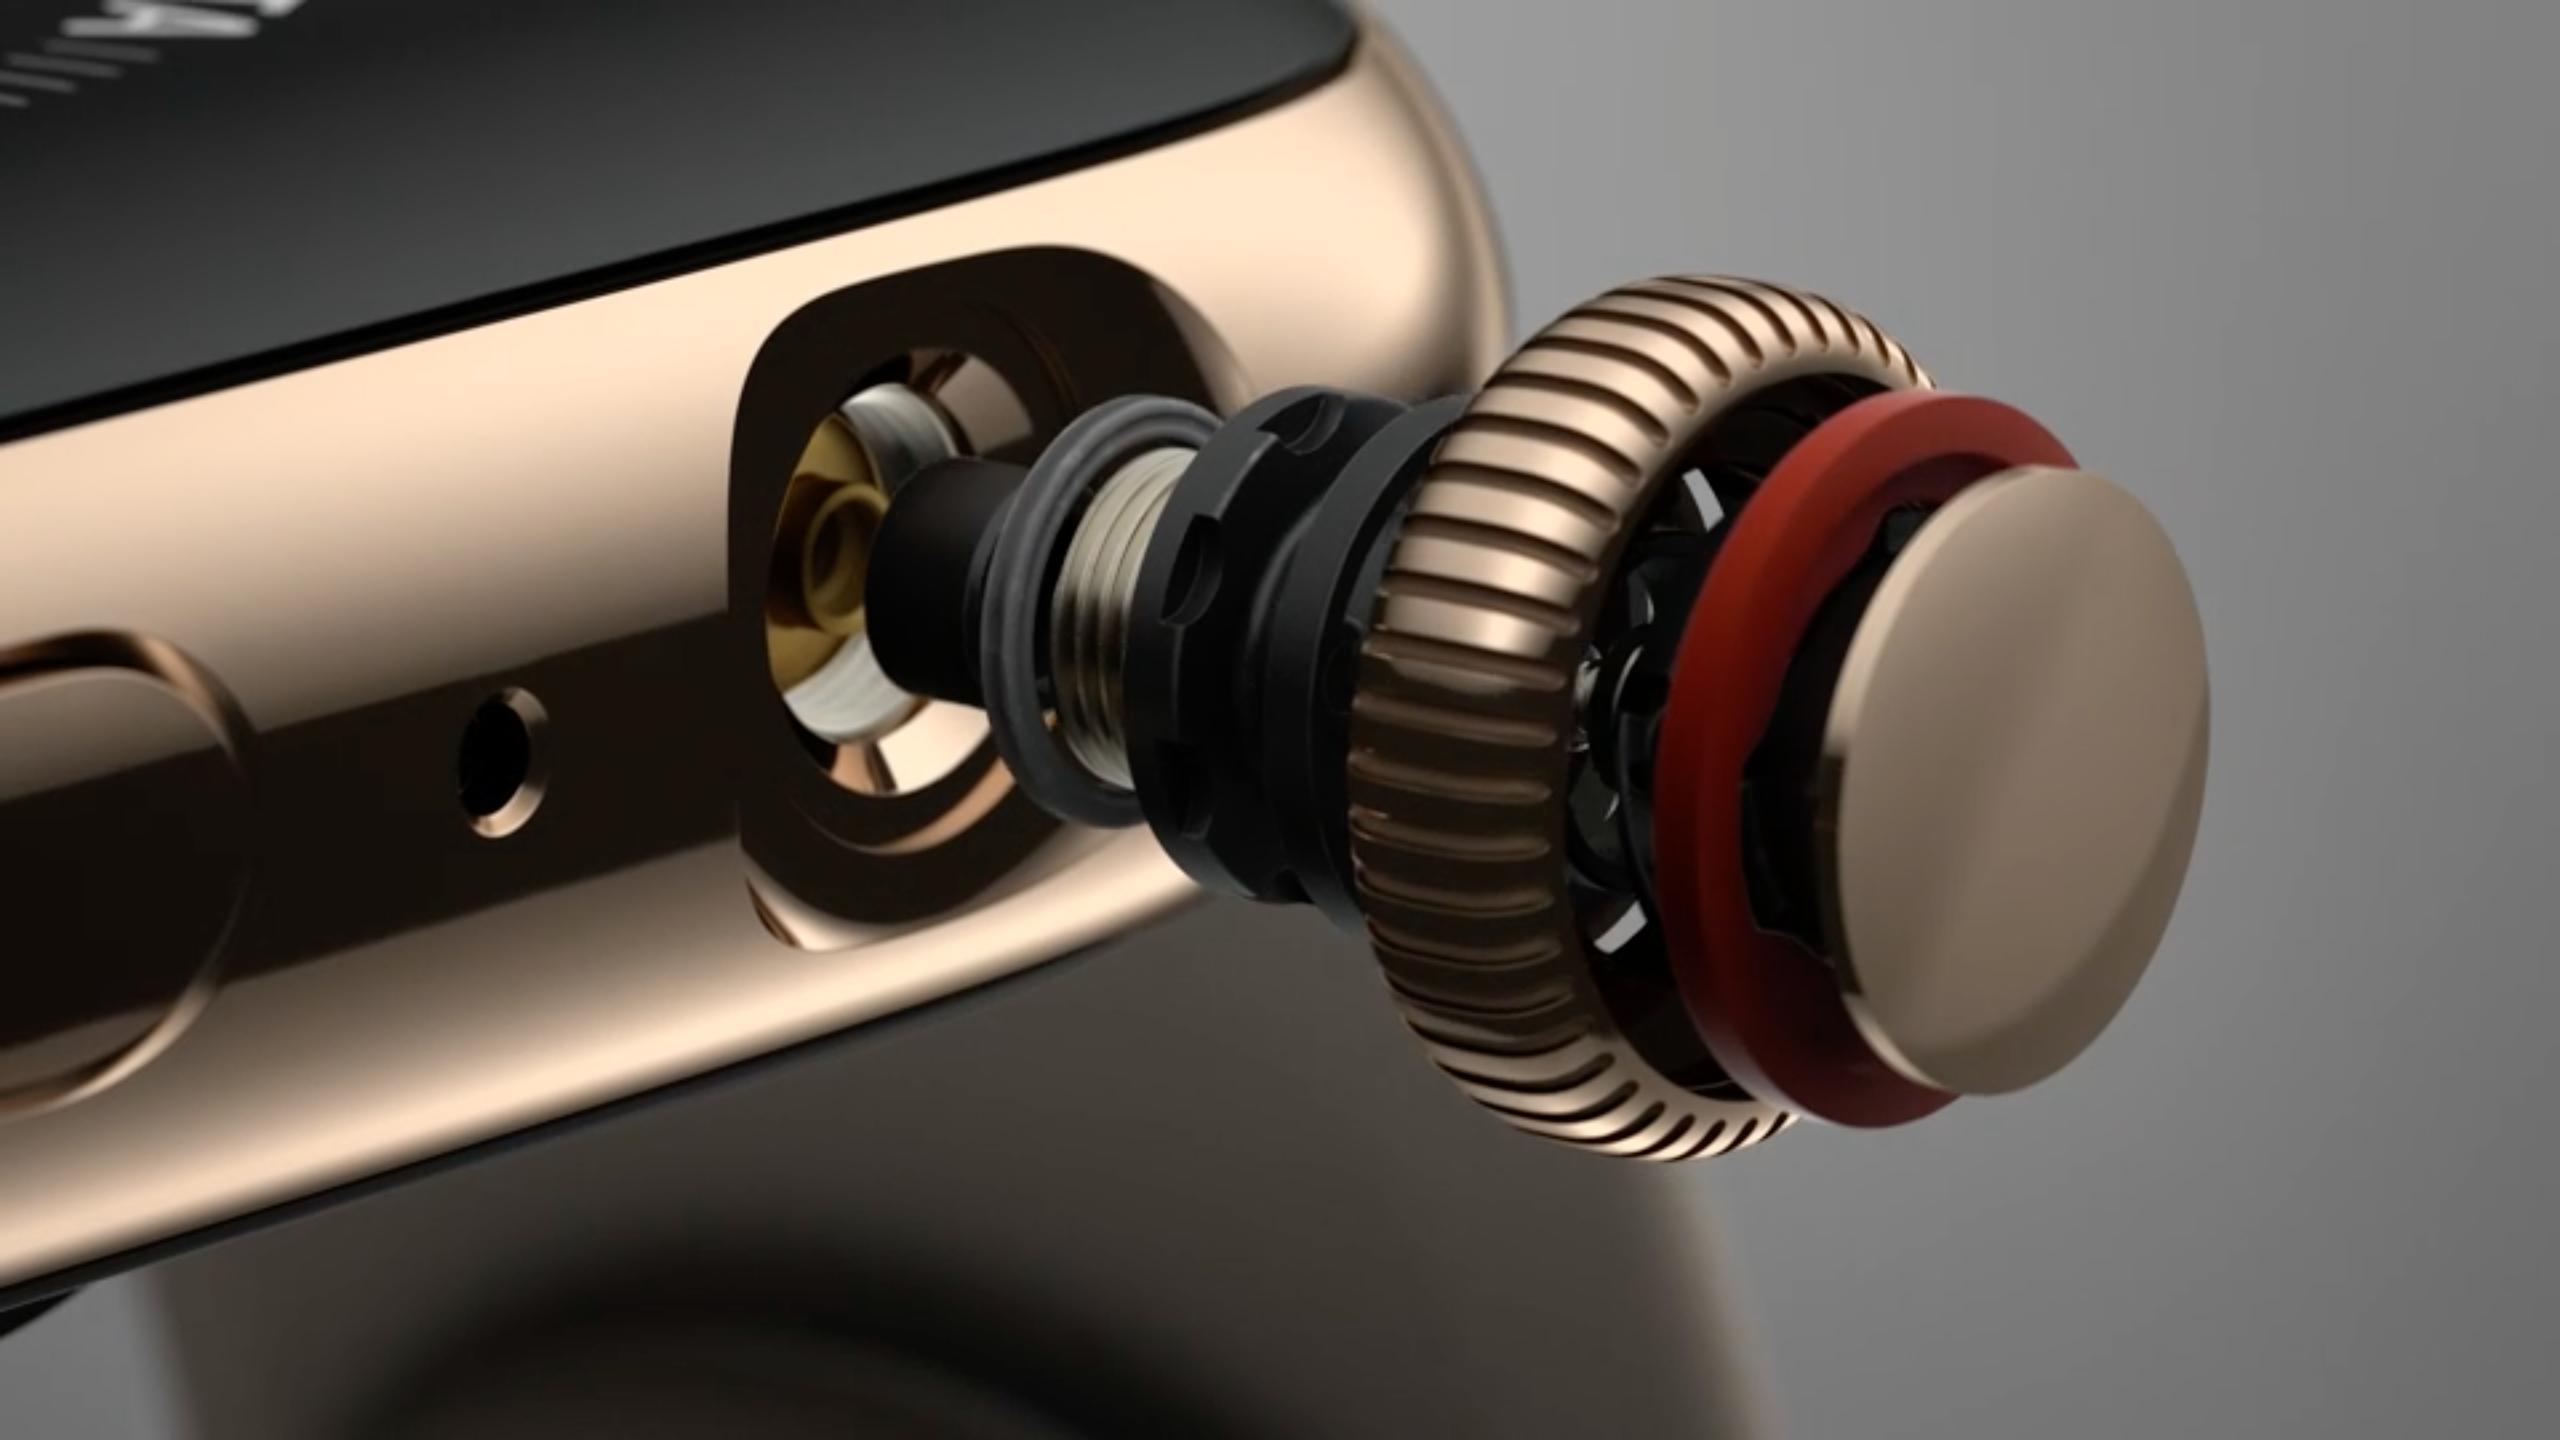 Apple Watch Series 4 teardown shows a much-improved Digital Crown